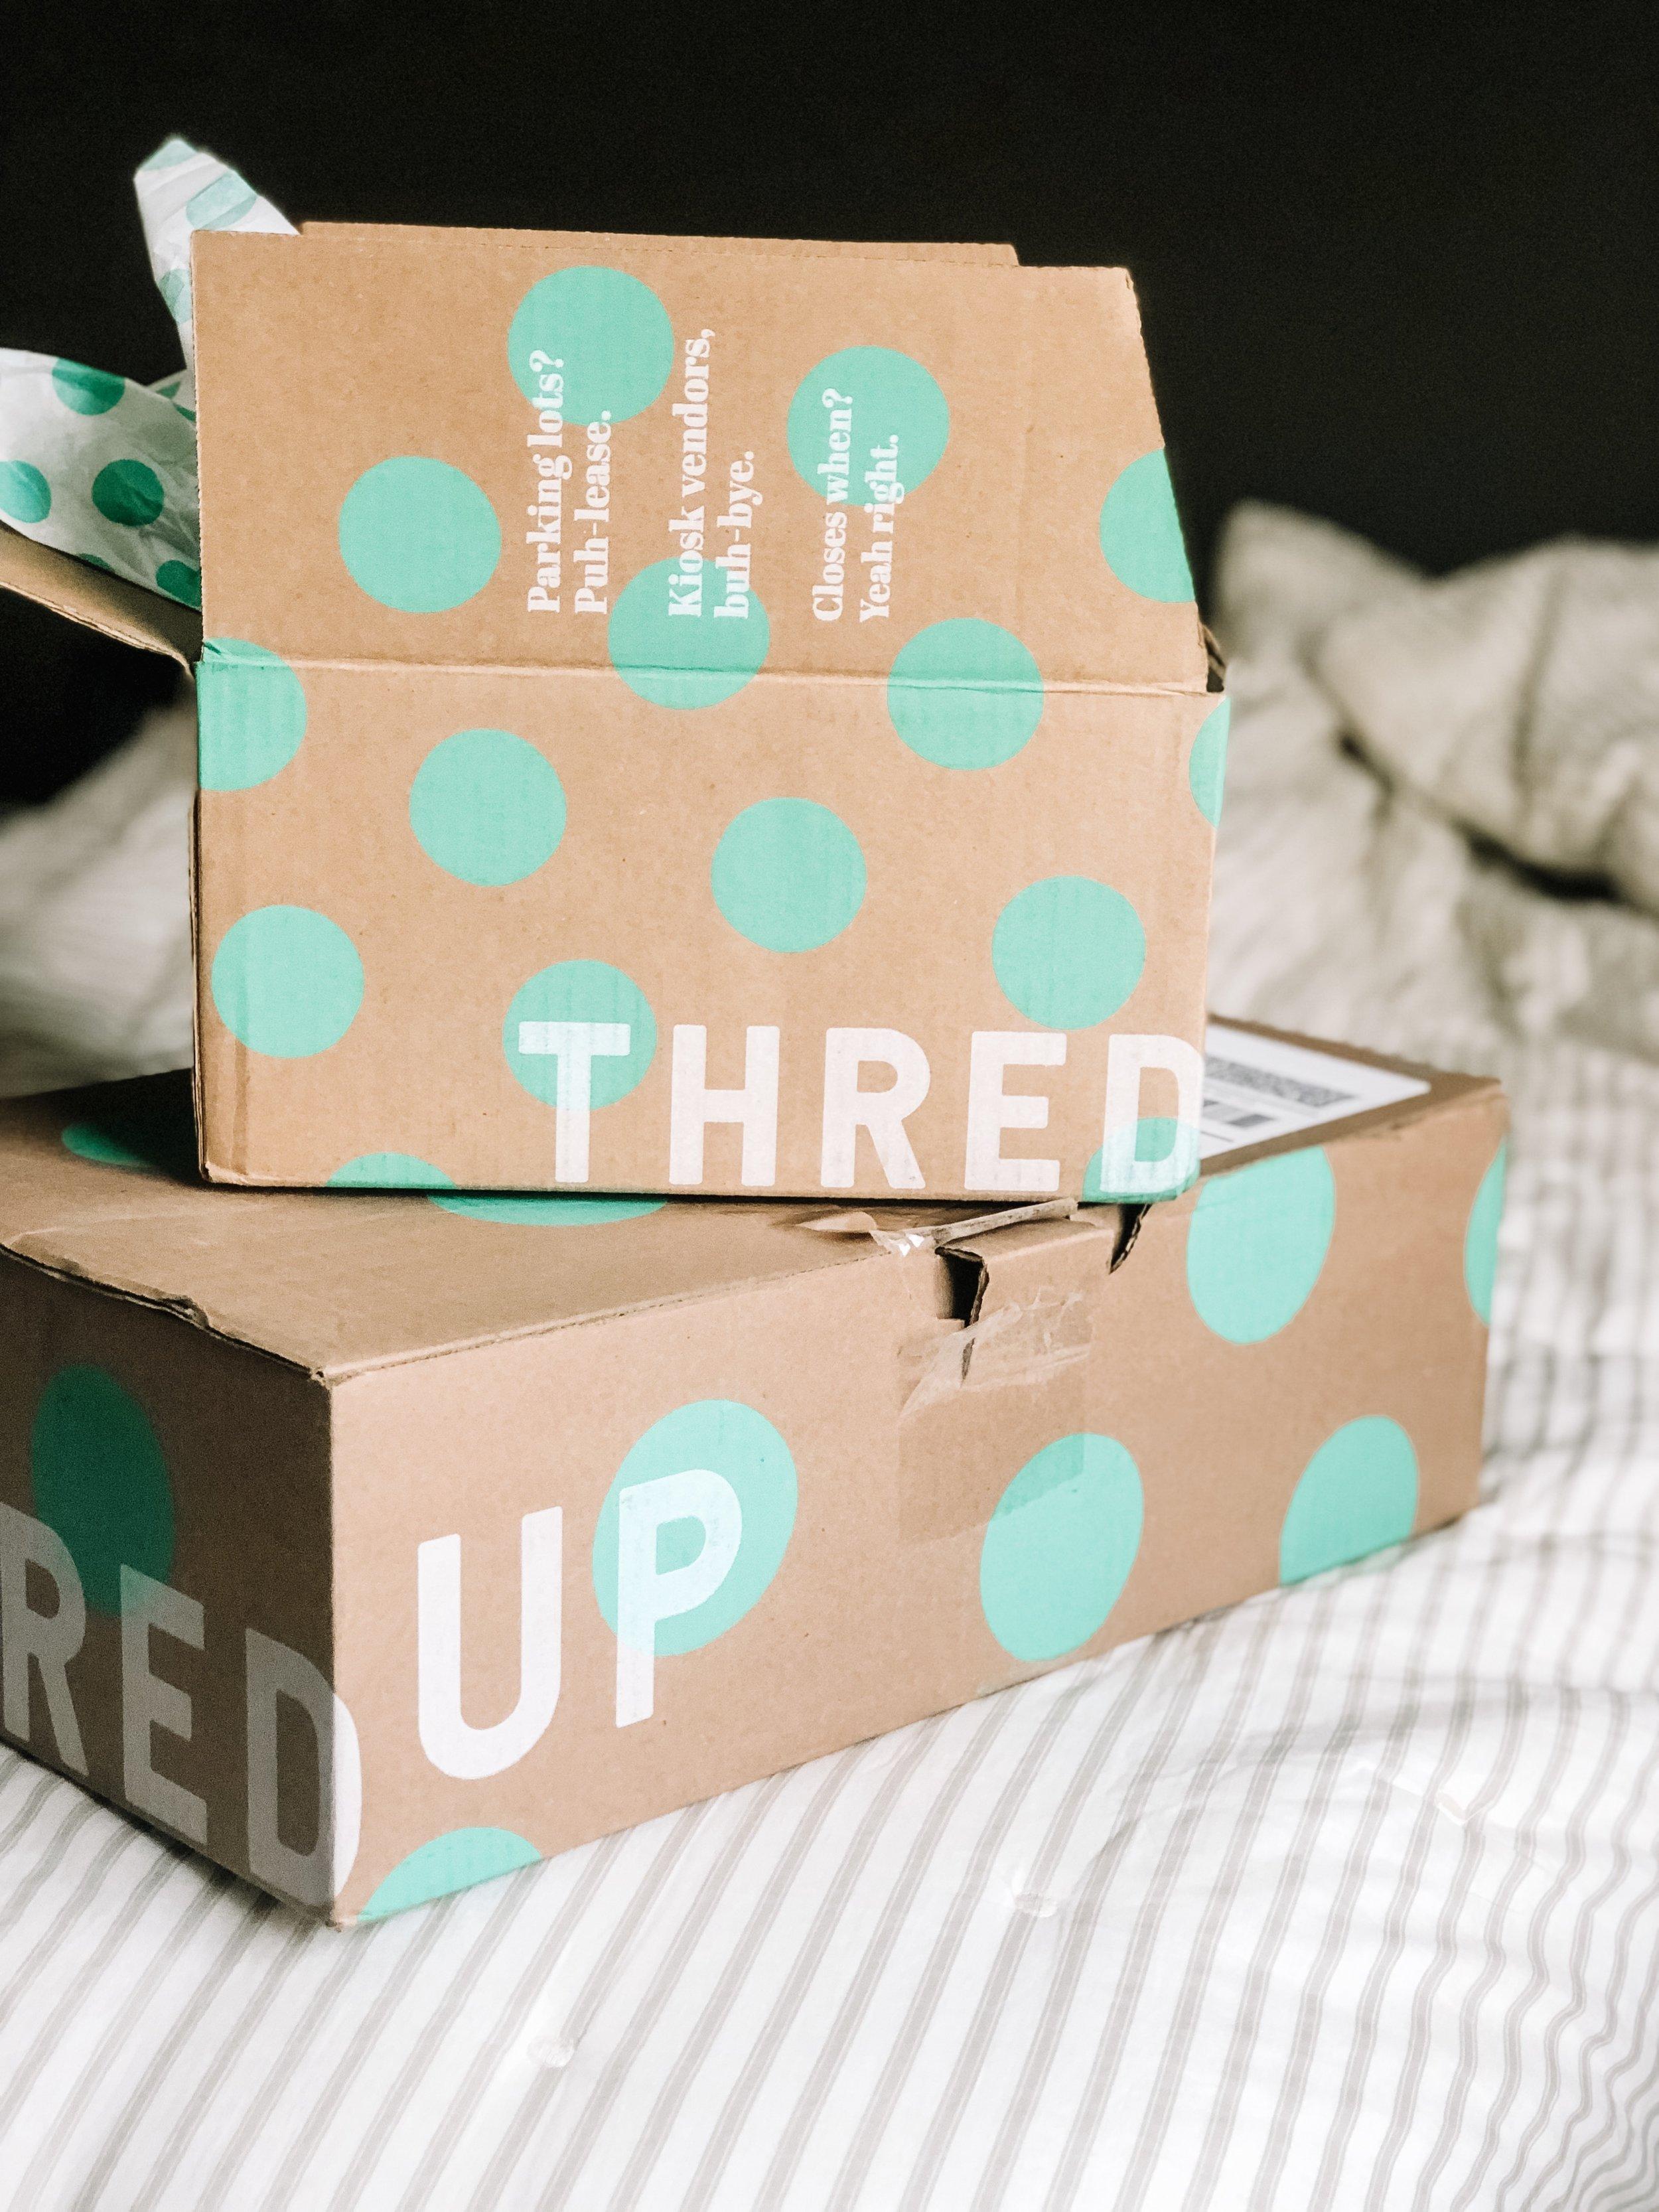 ThredUP Online Shopping Tips